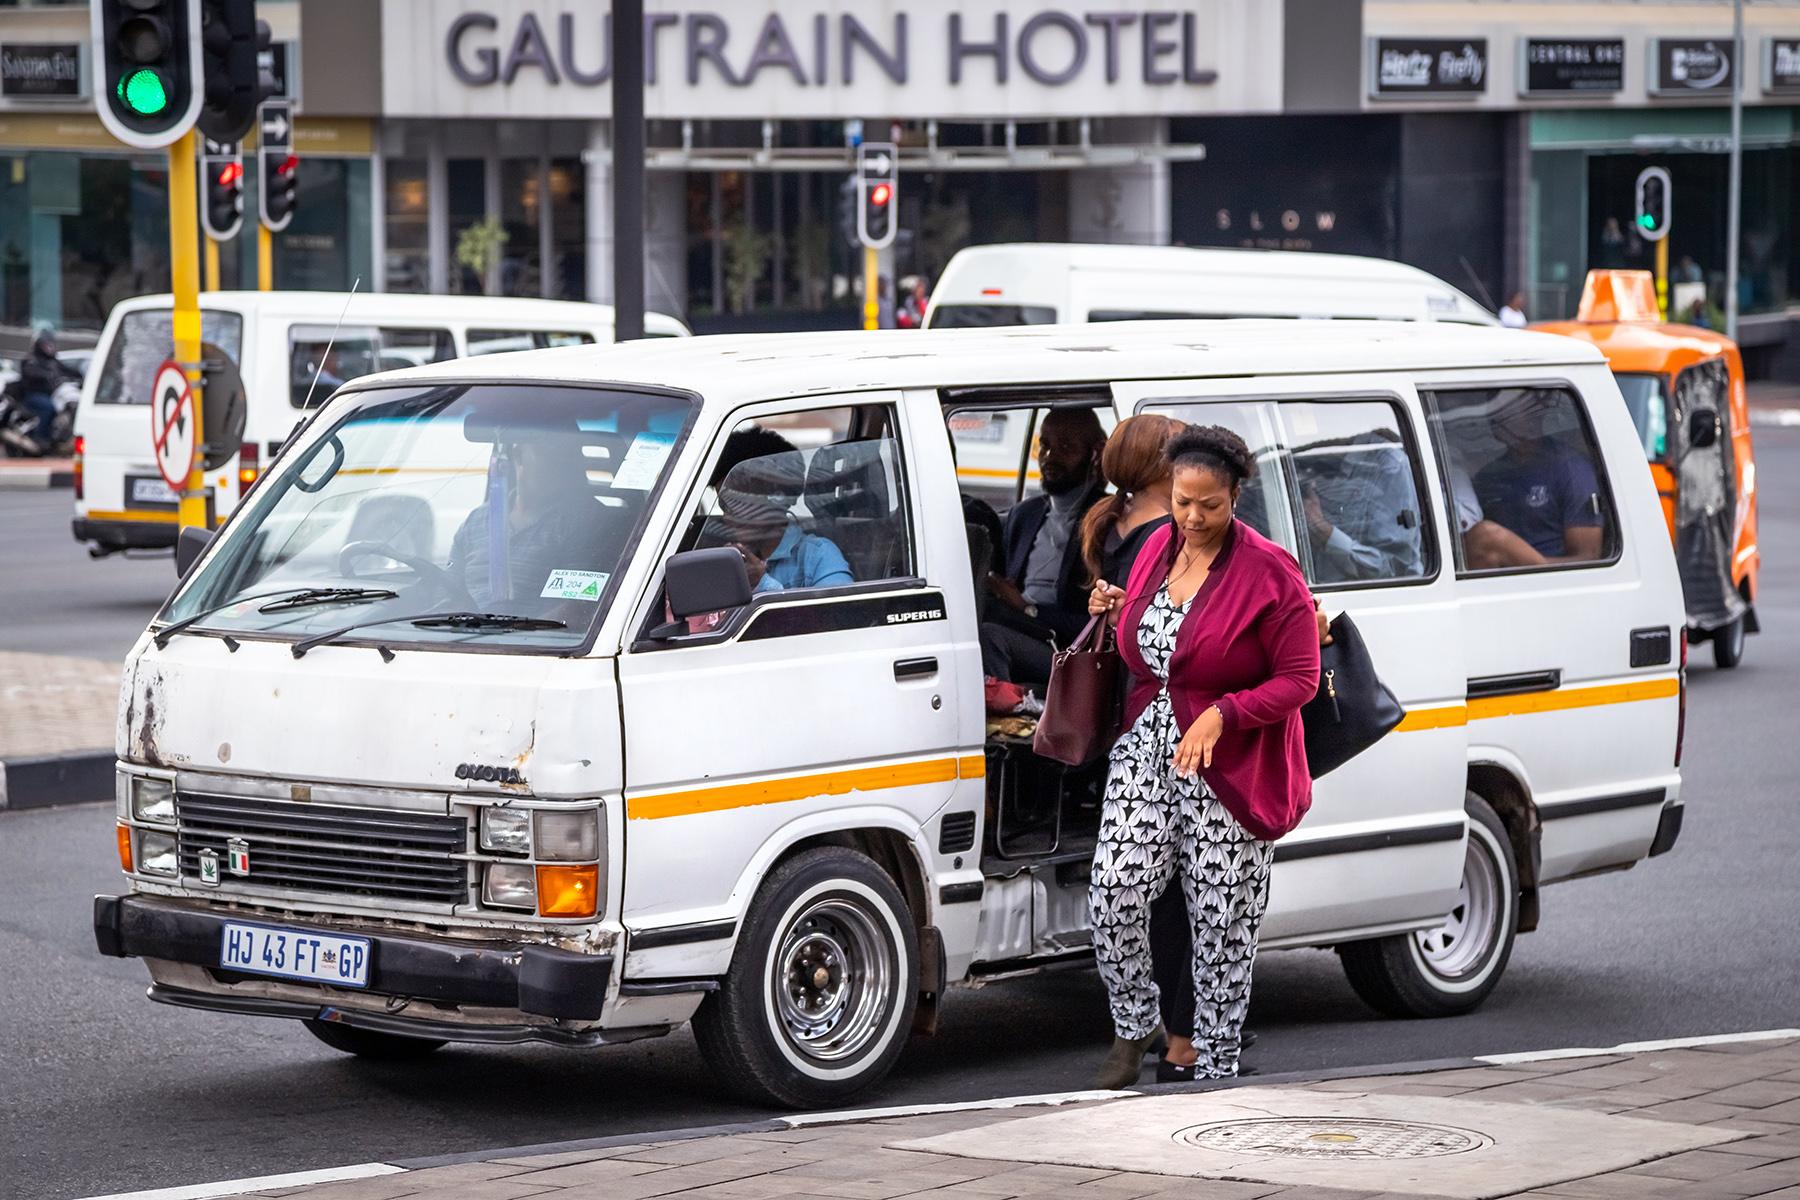 Minibus taxi in Johannesburg